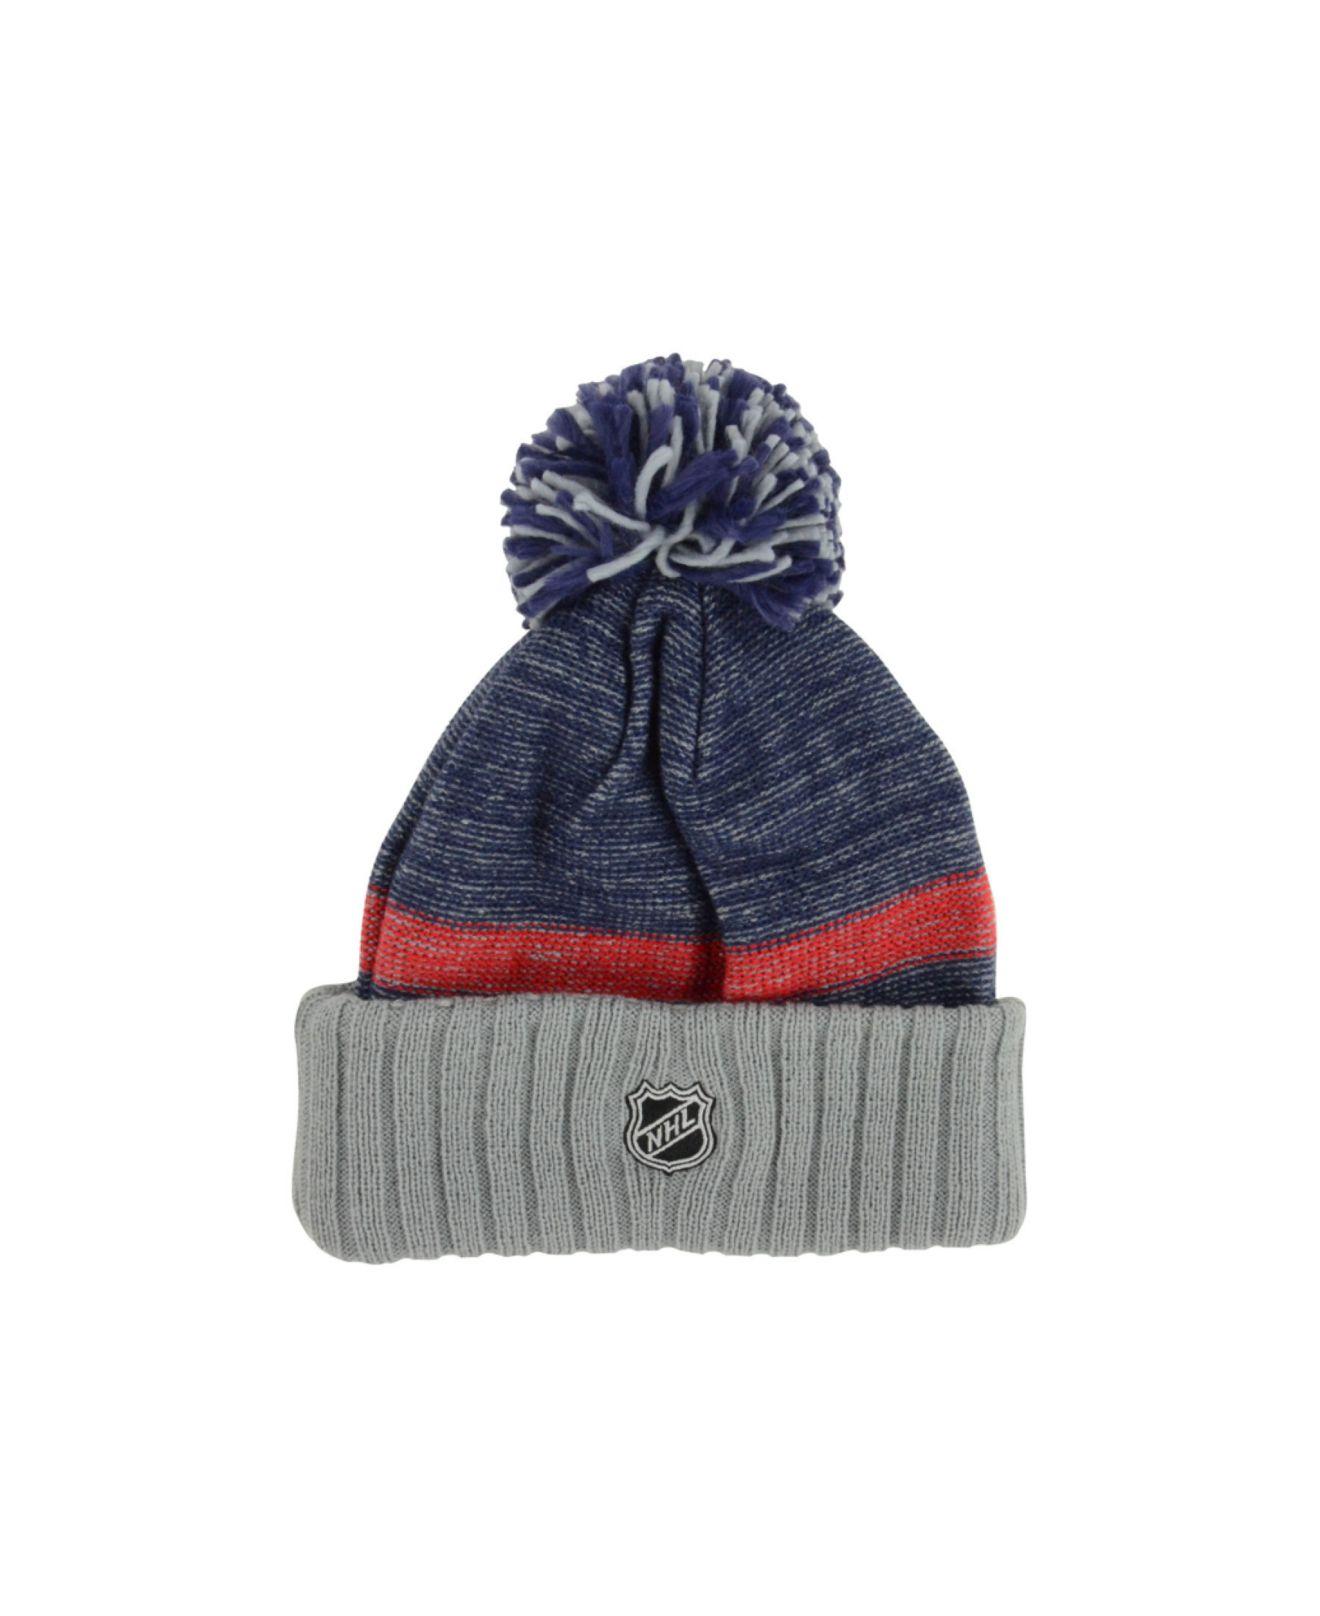 542aee17bef Lyst - Reebok Columbus Blue Jackets Pom Knit Hat in Blue for Men